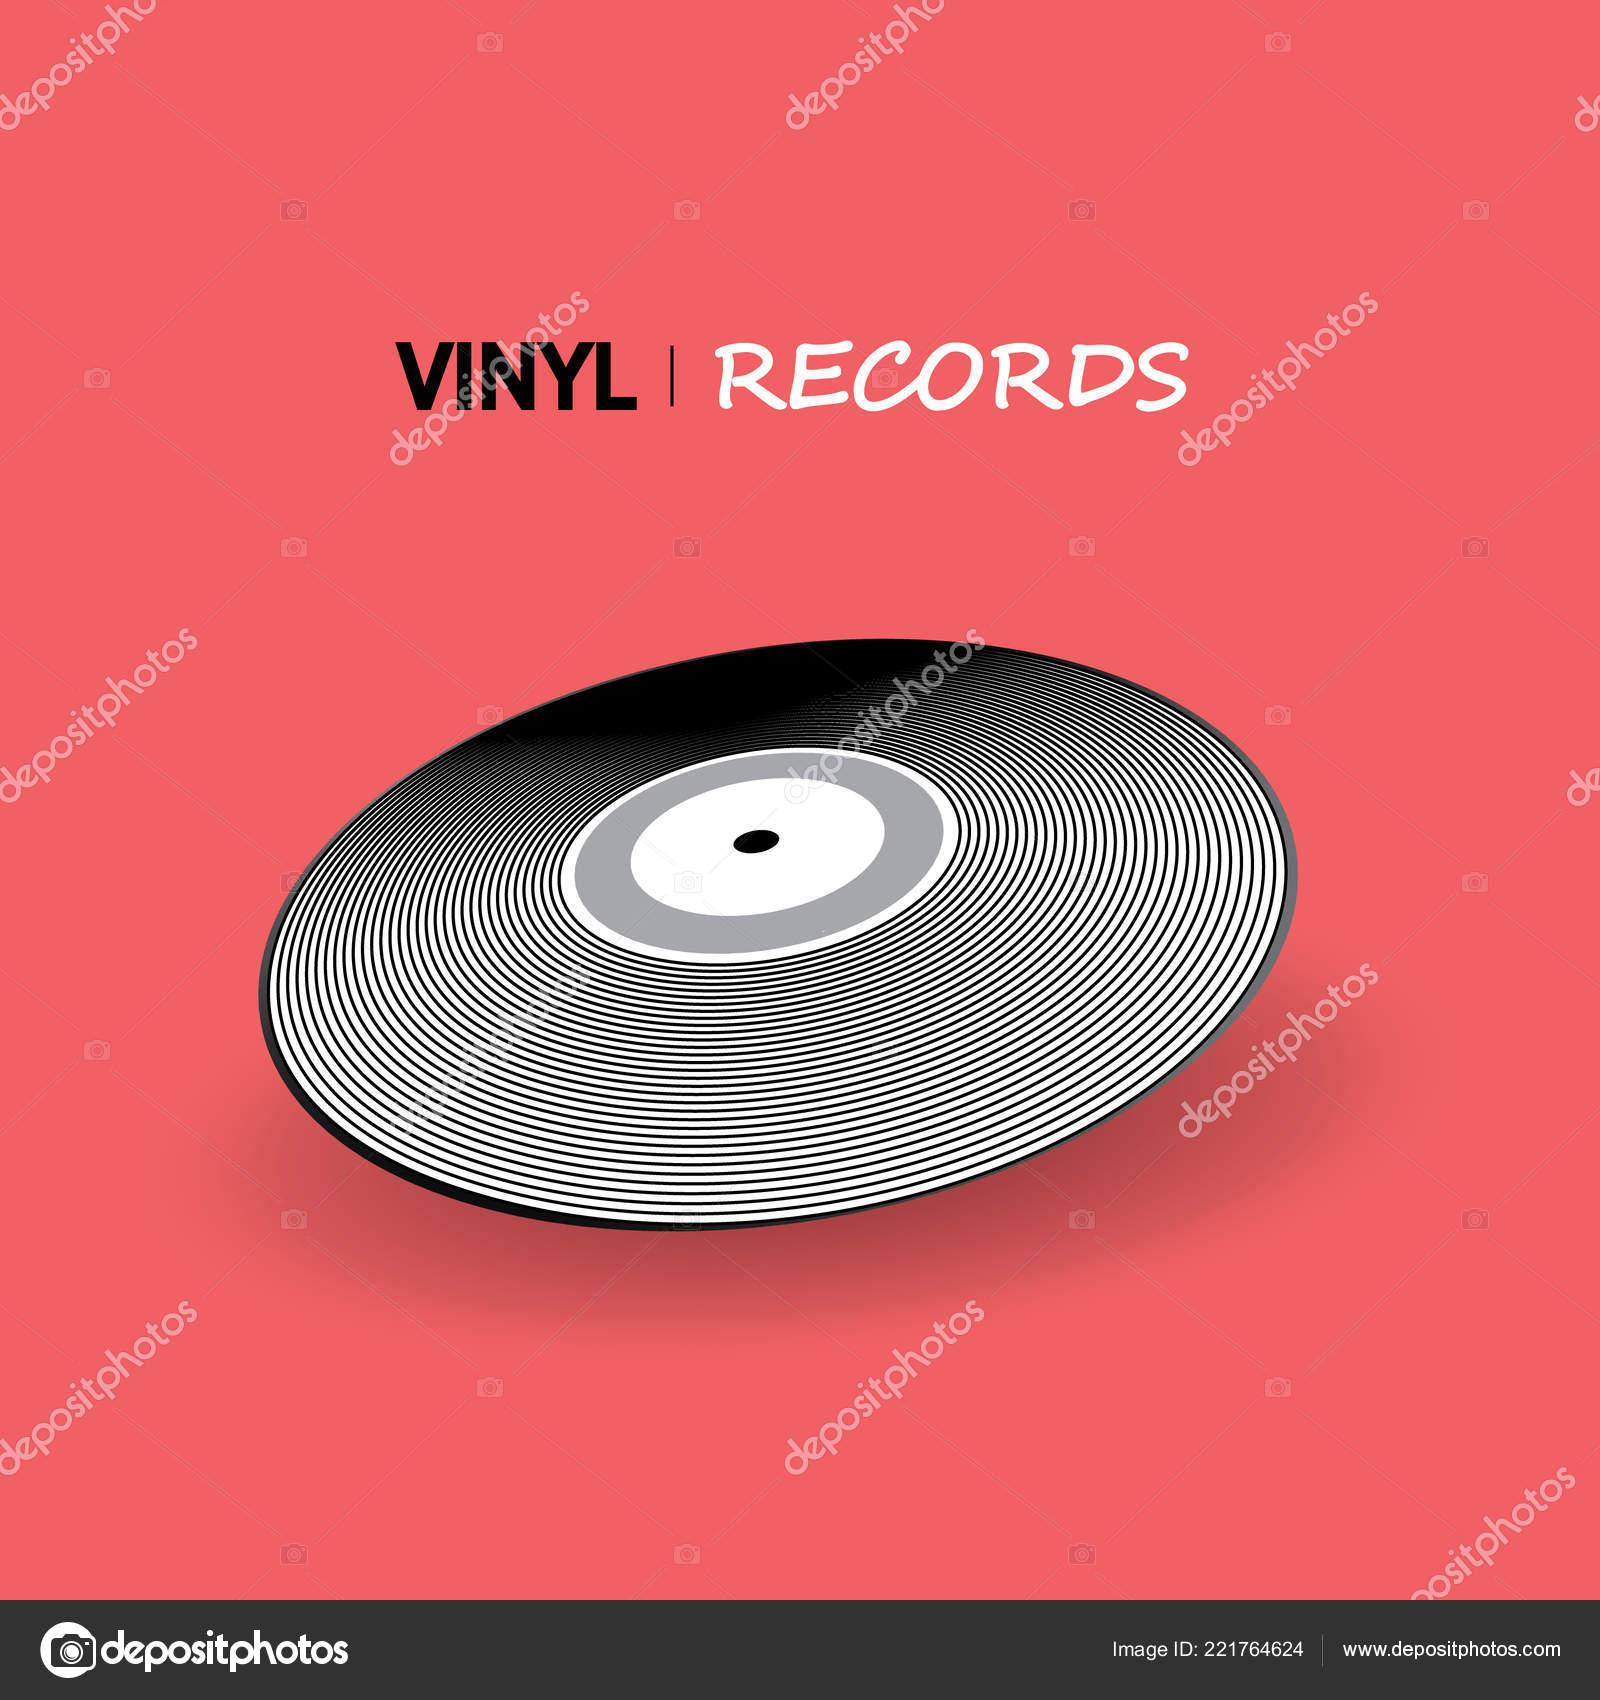 poster vinyl player record music label logo trendy gradient line stock vector c tinakris 221764624 depositphotos